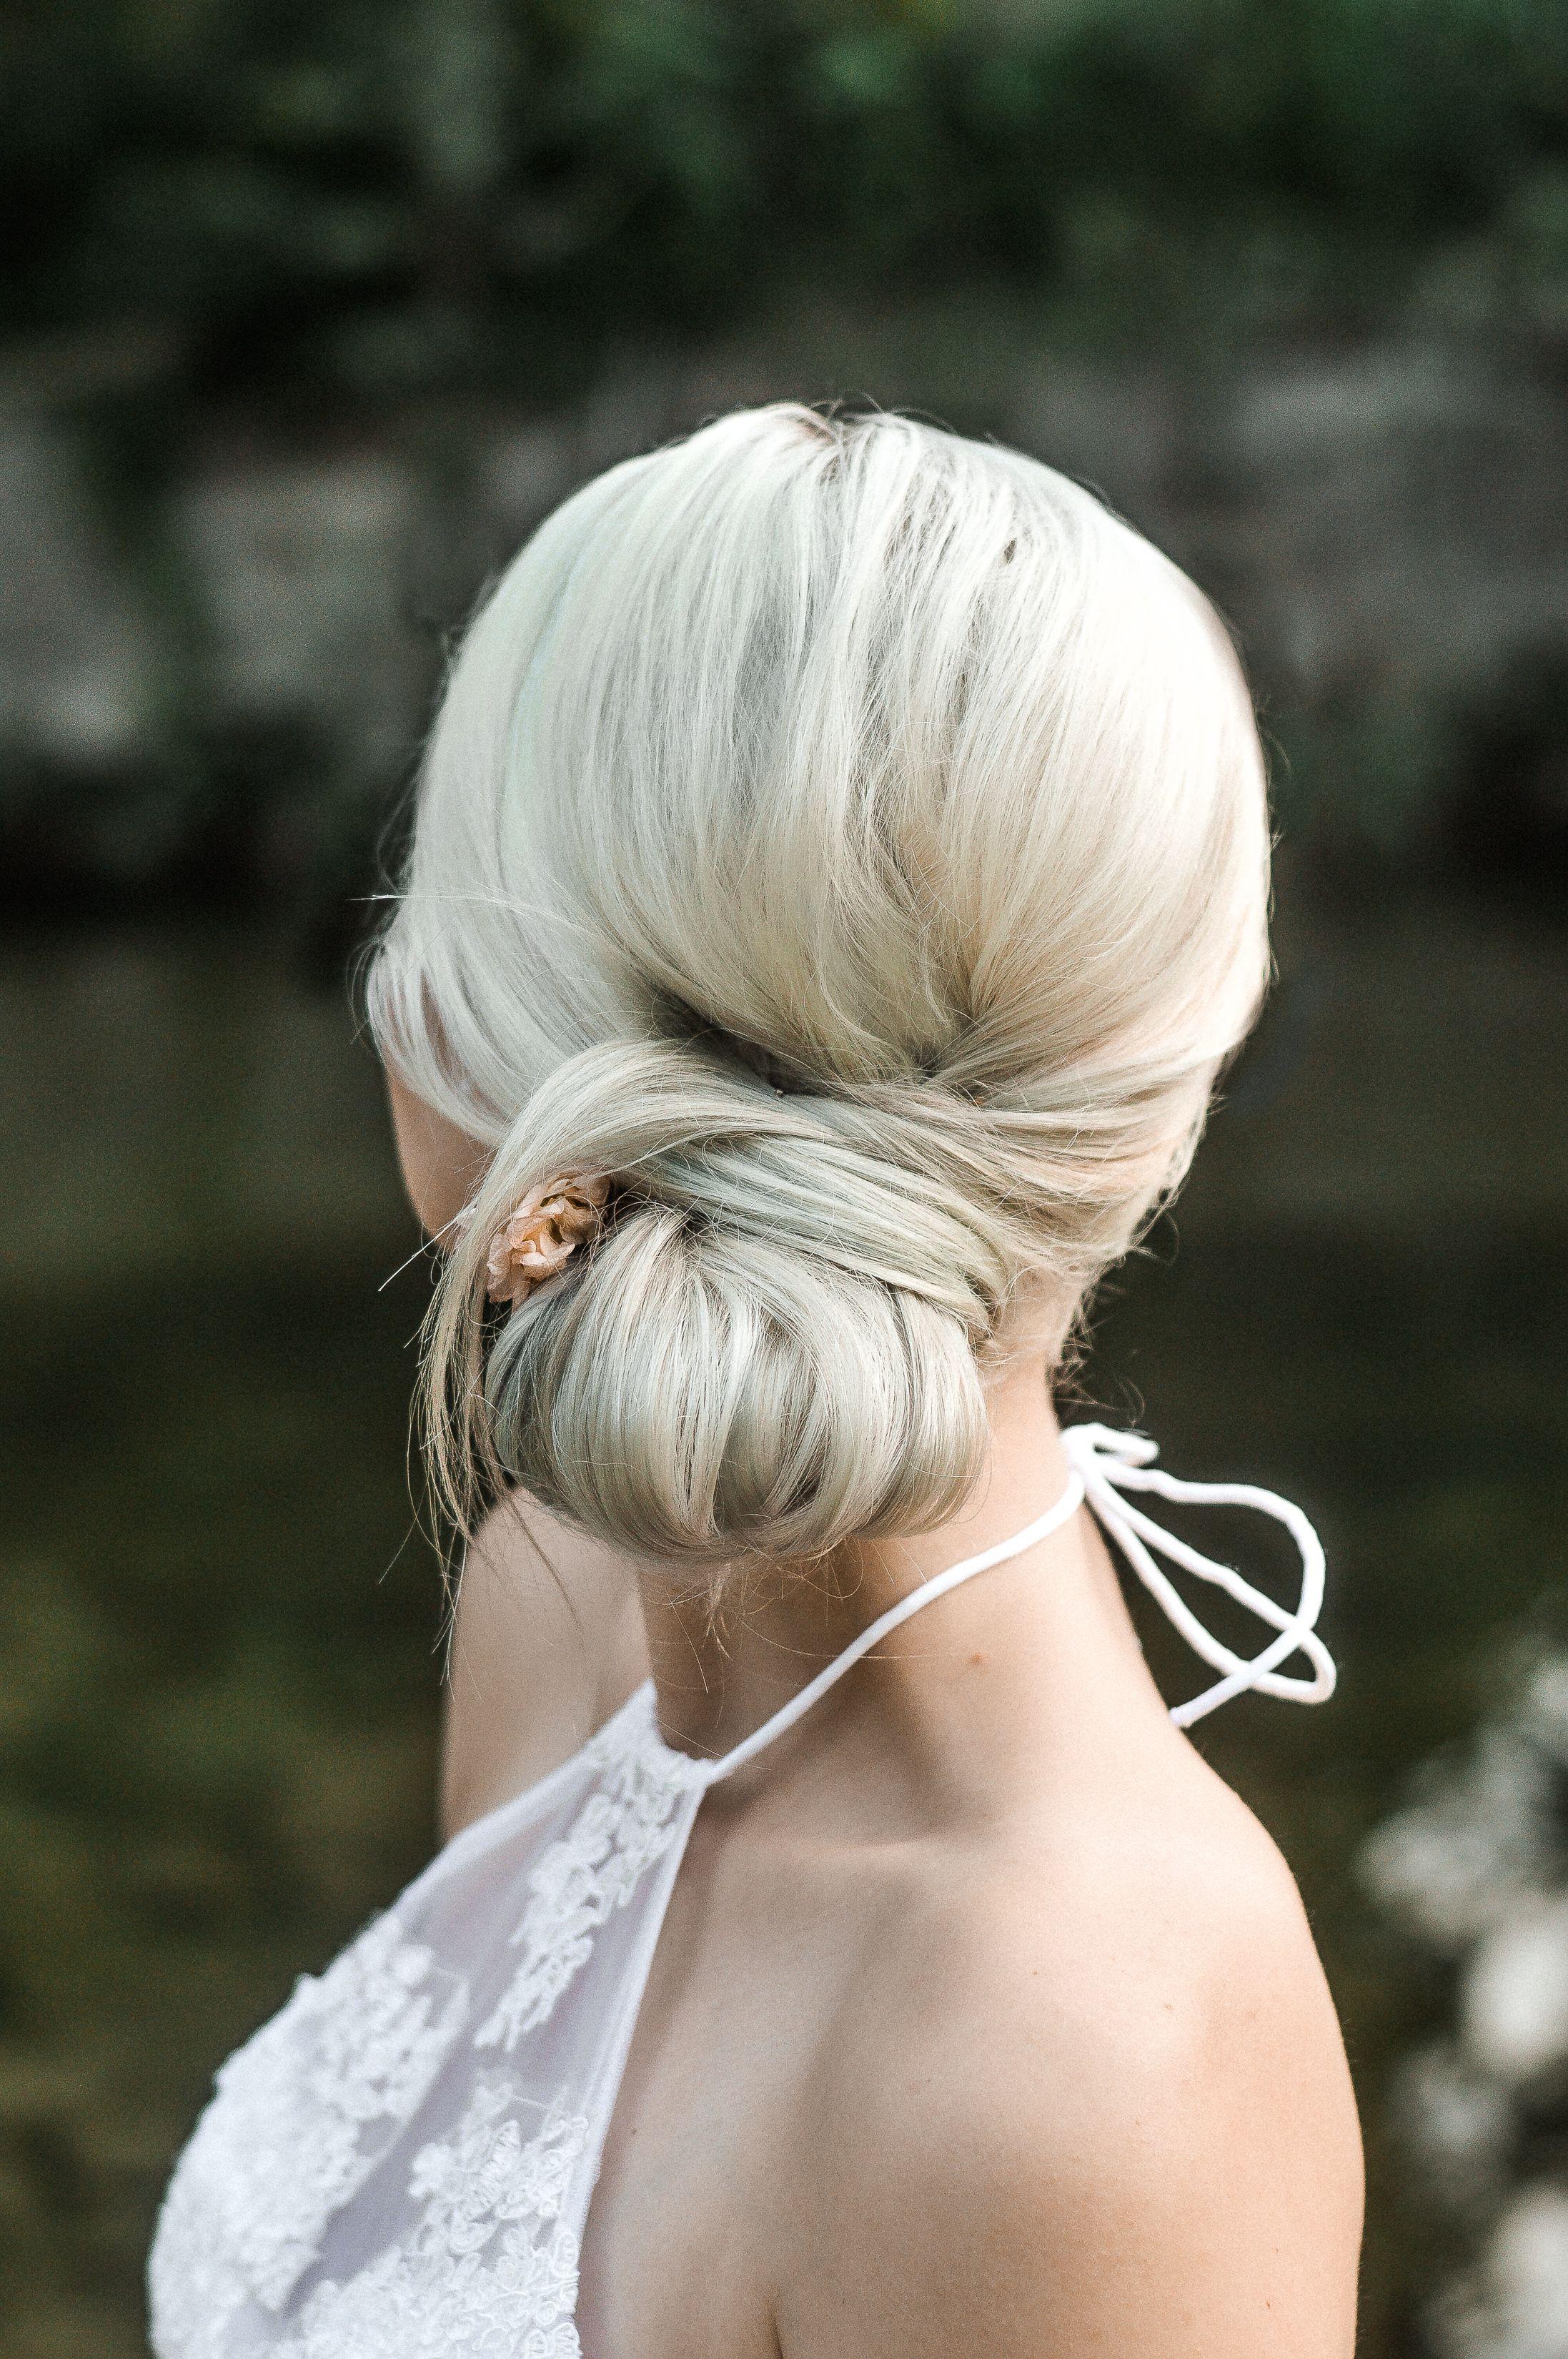 Sleek Wedding Updo Bridal Hair Sleek Wedding Updo Hair And Makeup Artist Artistic Hair